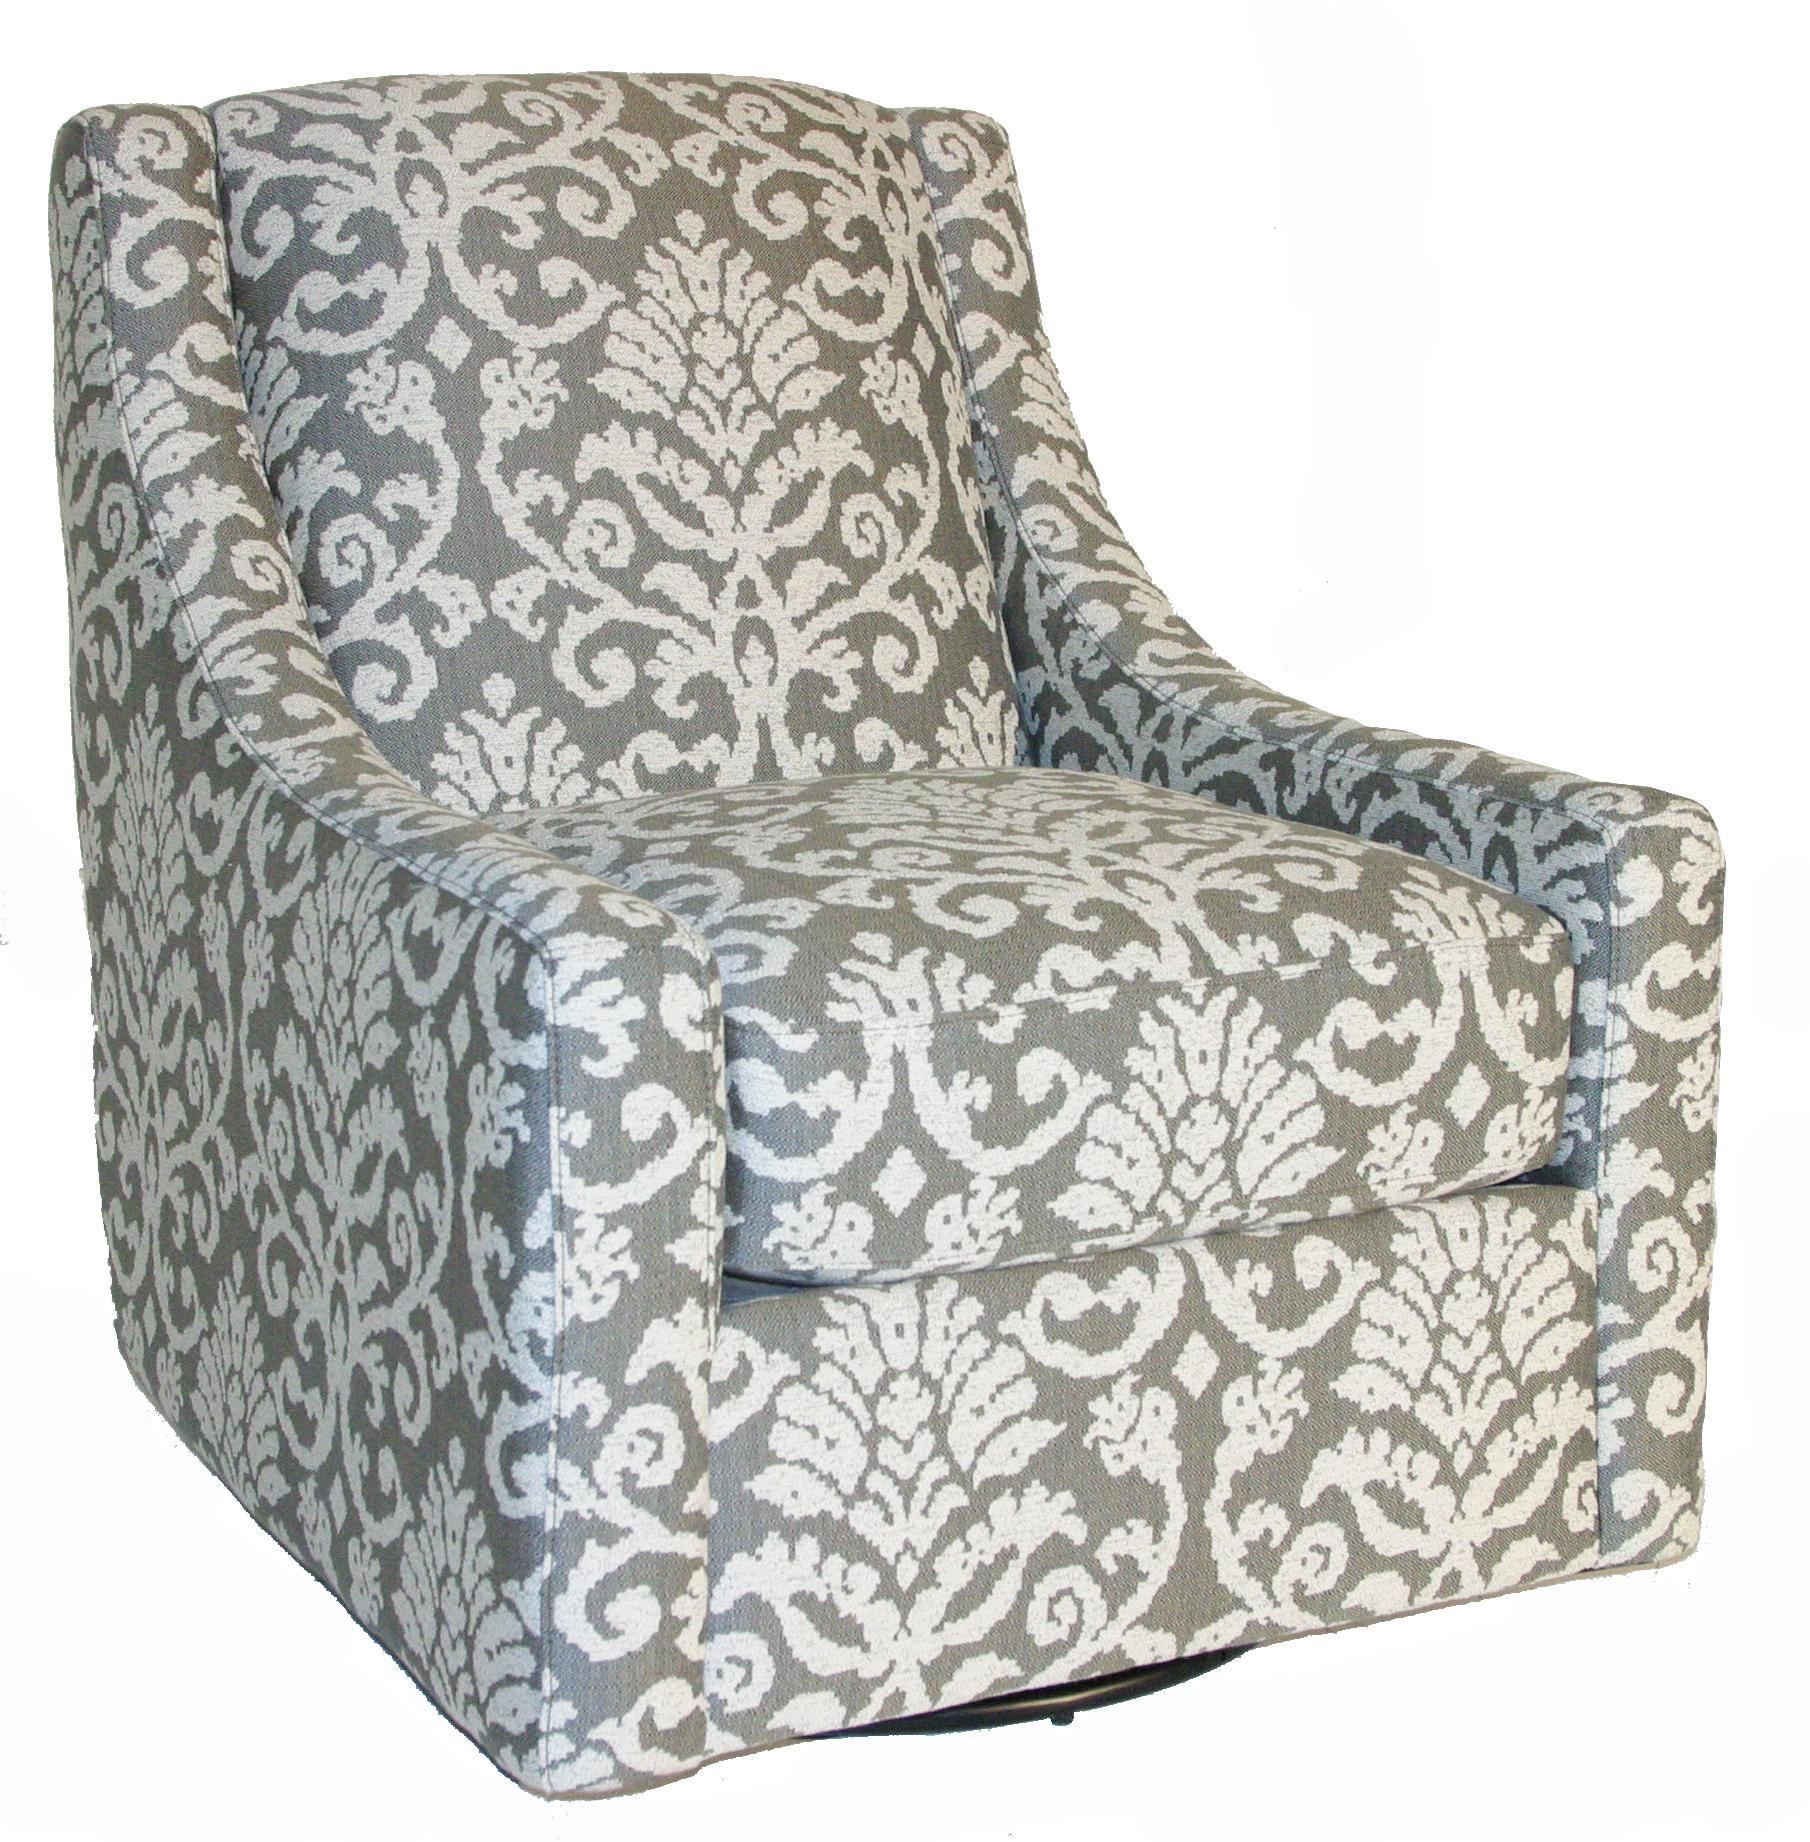 Bauhaus Connick Contemporary Swivel Chair - Item Number: 452U-44 Katniss Pewter